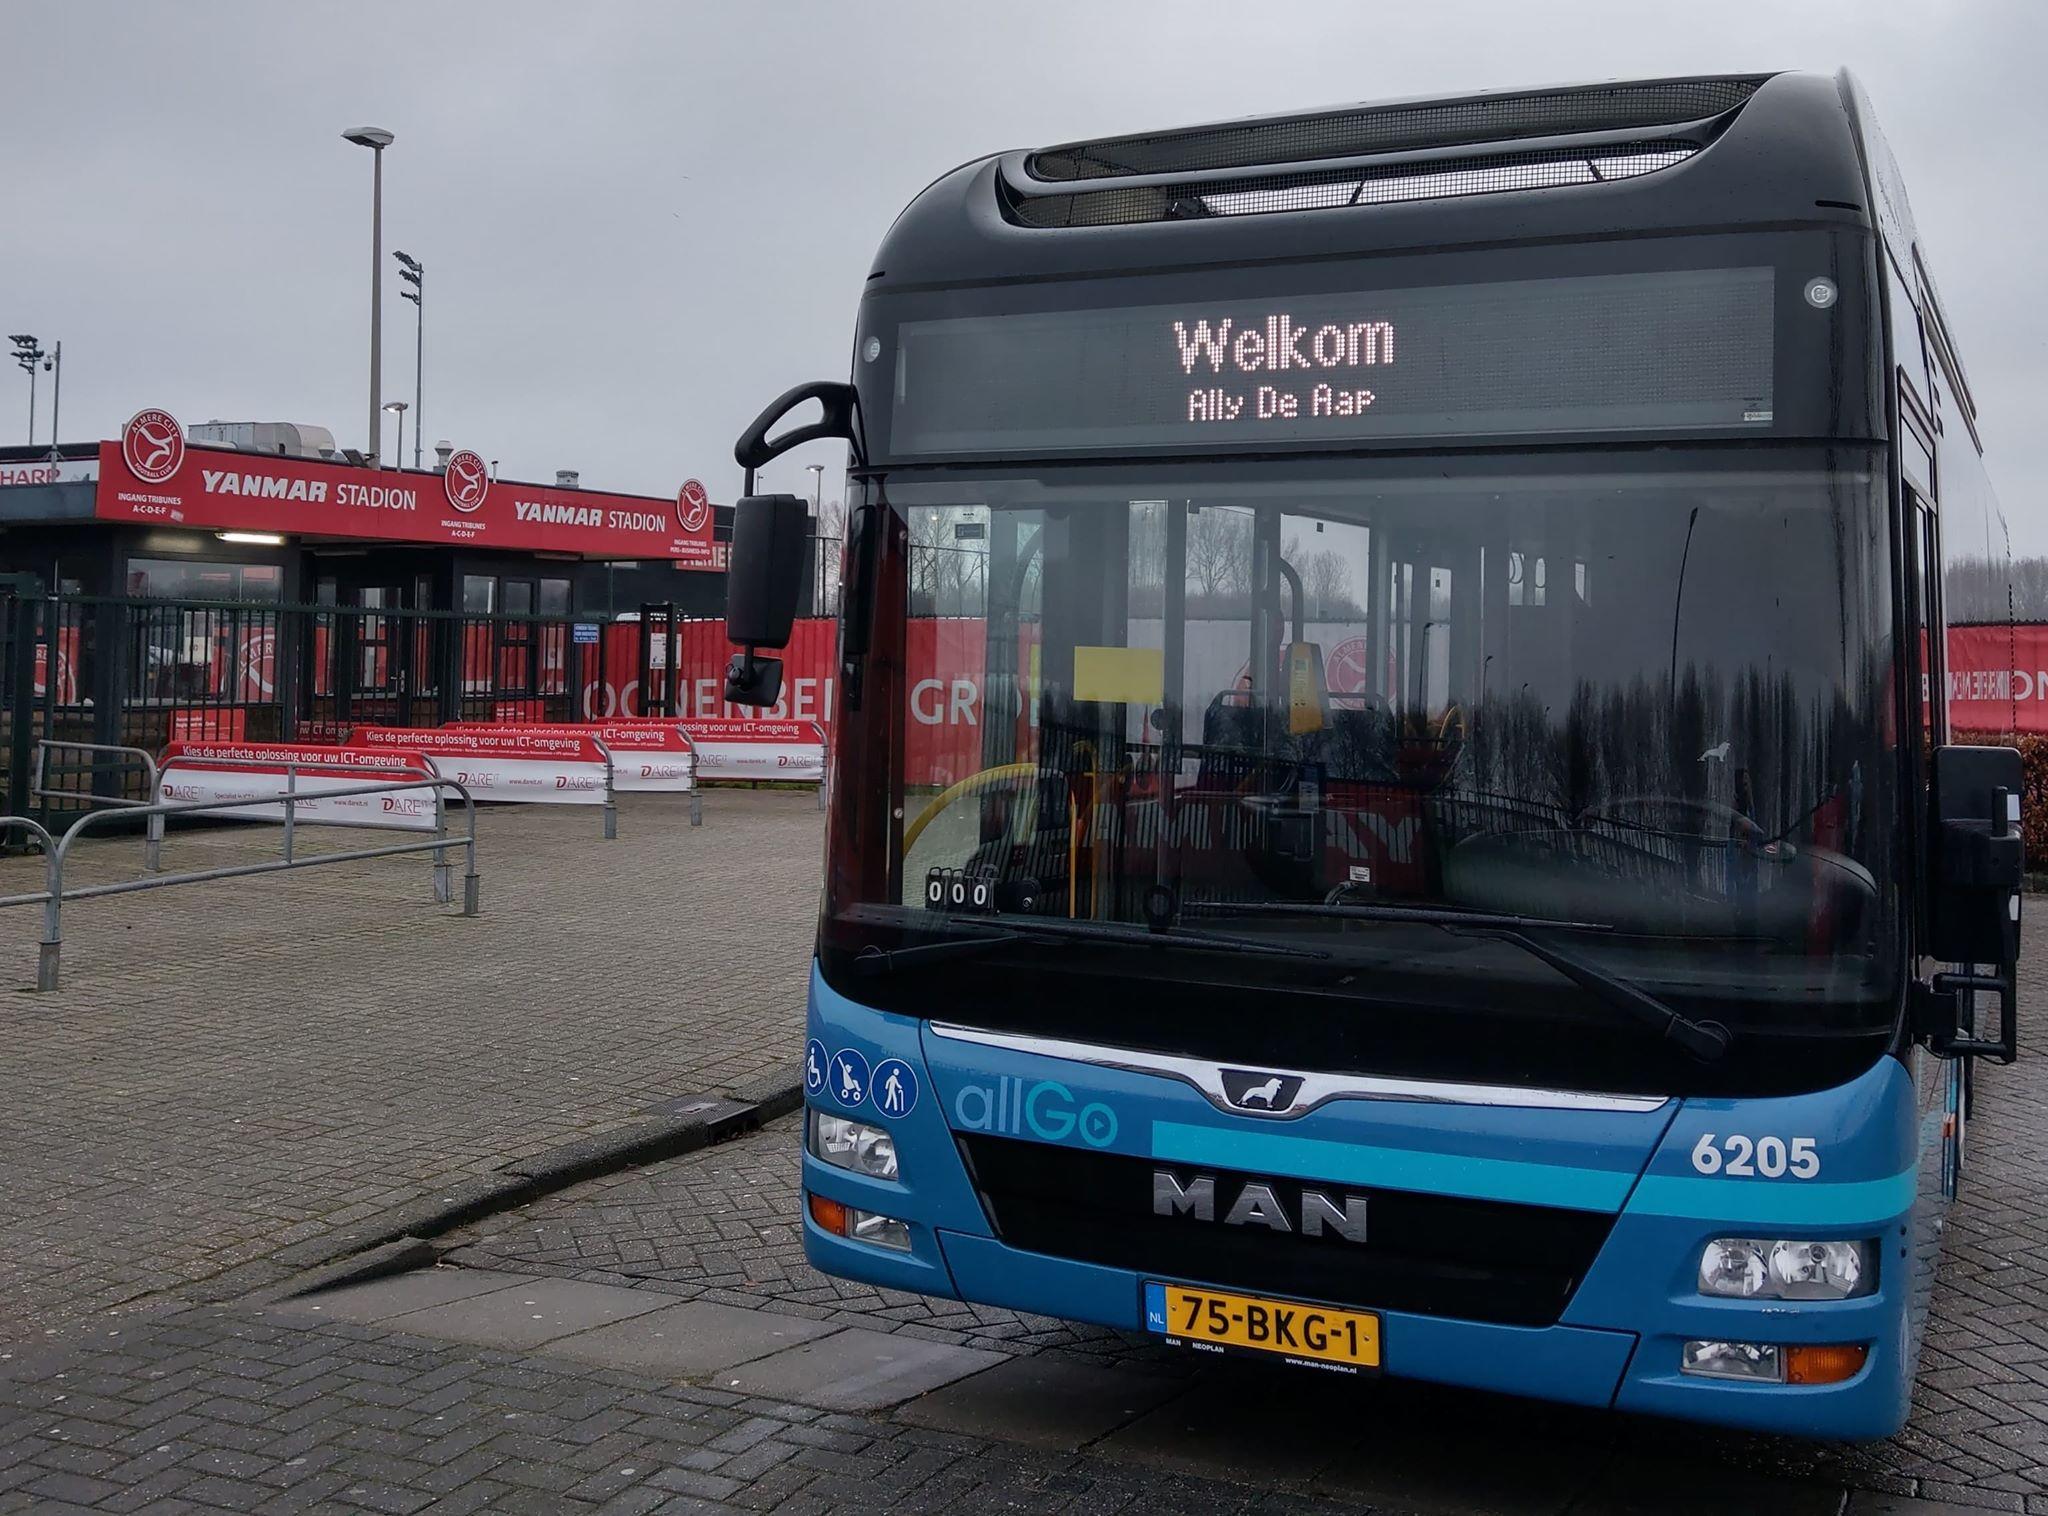 Buschauffeurs Keolis te gast bij Almere City FC - De Graafschap